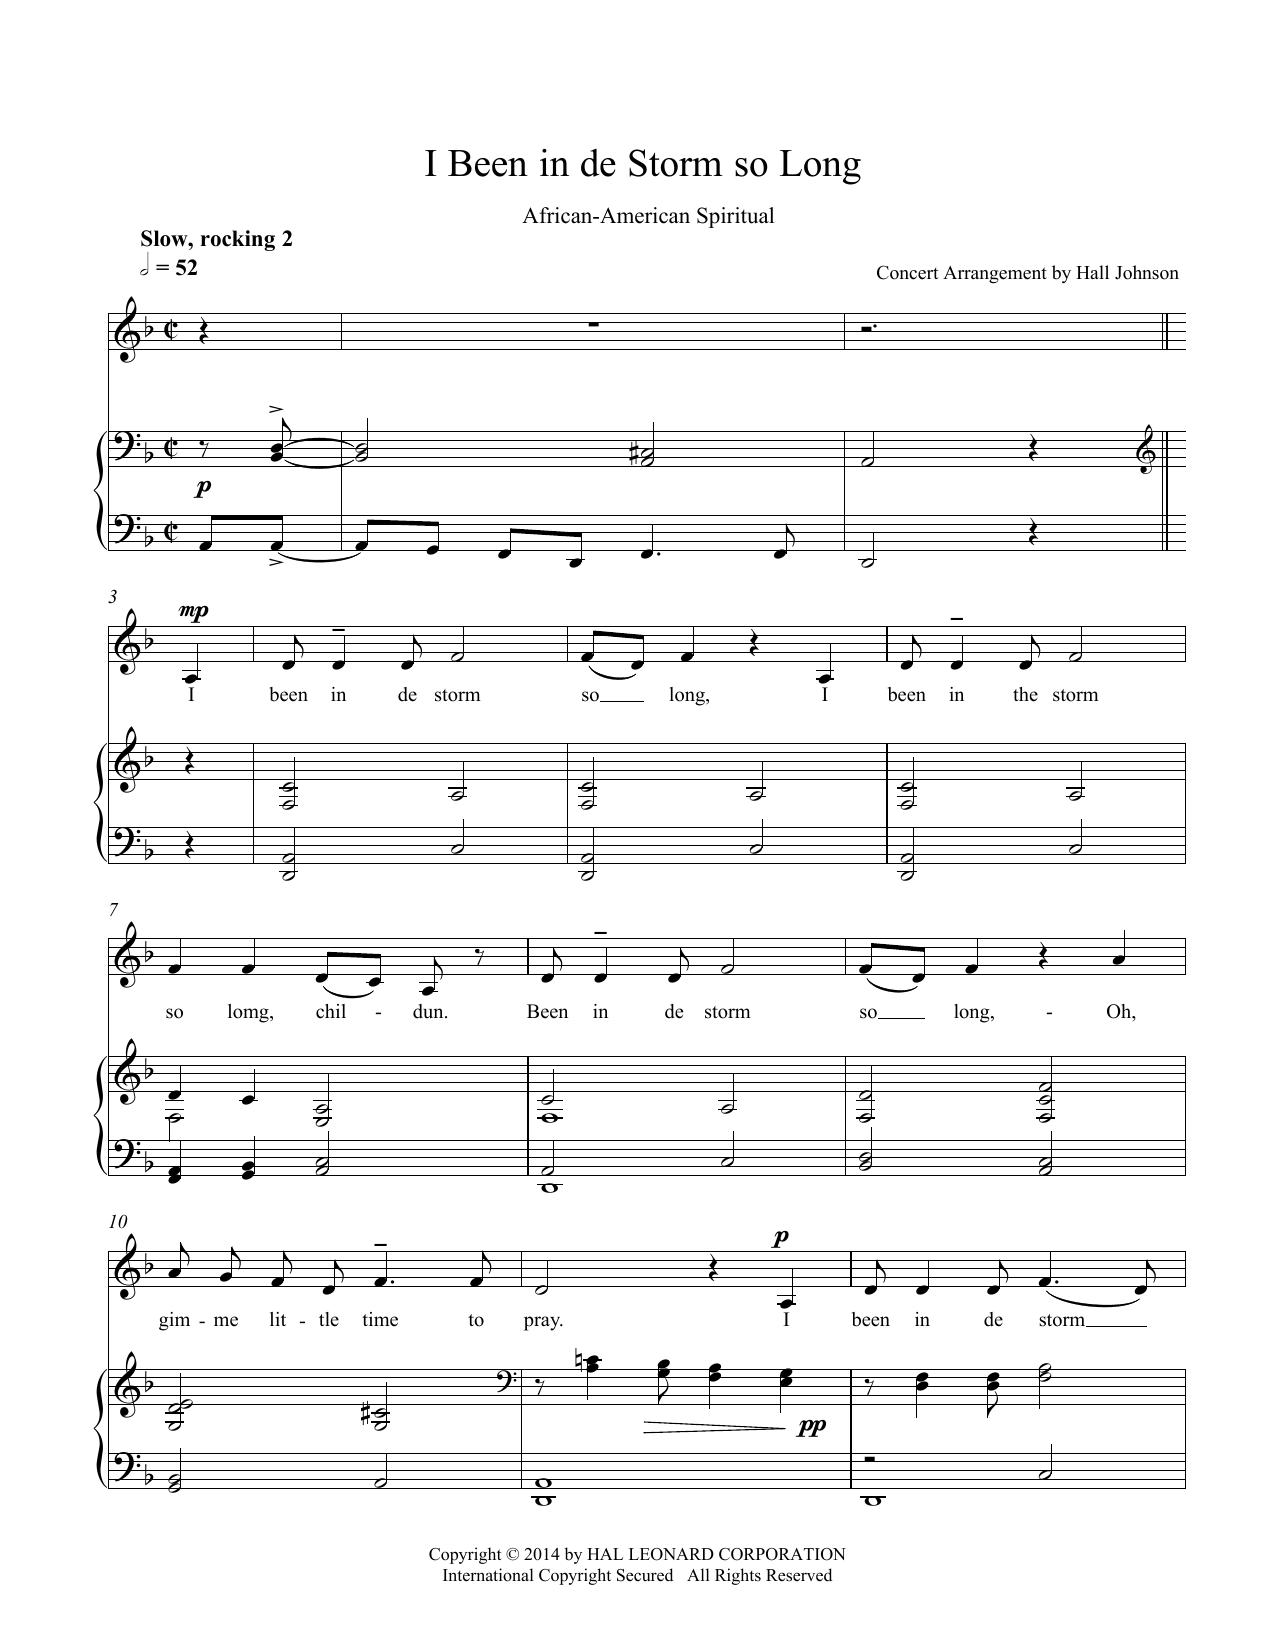 I Been in de Storm So Long (D minor) Sheet Music